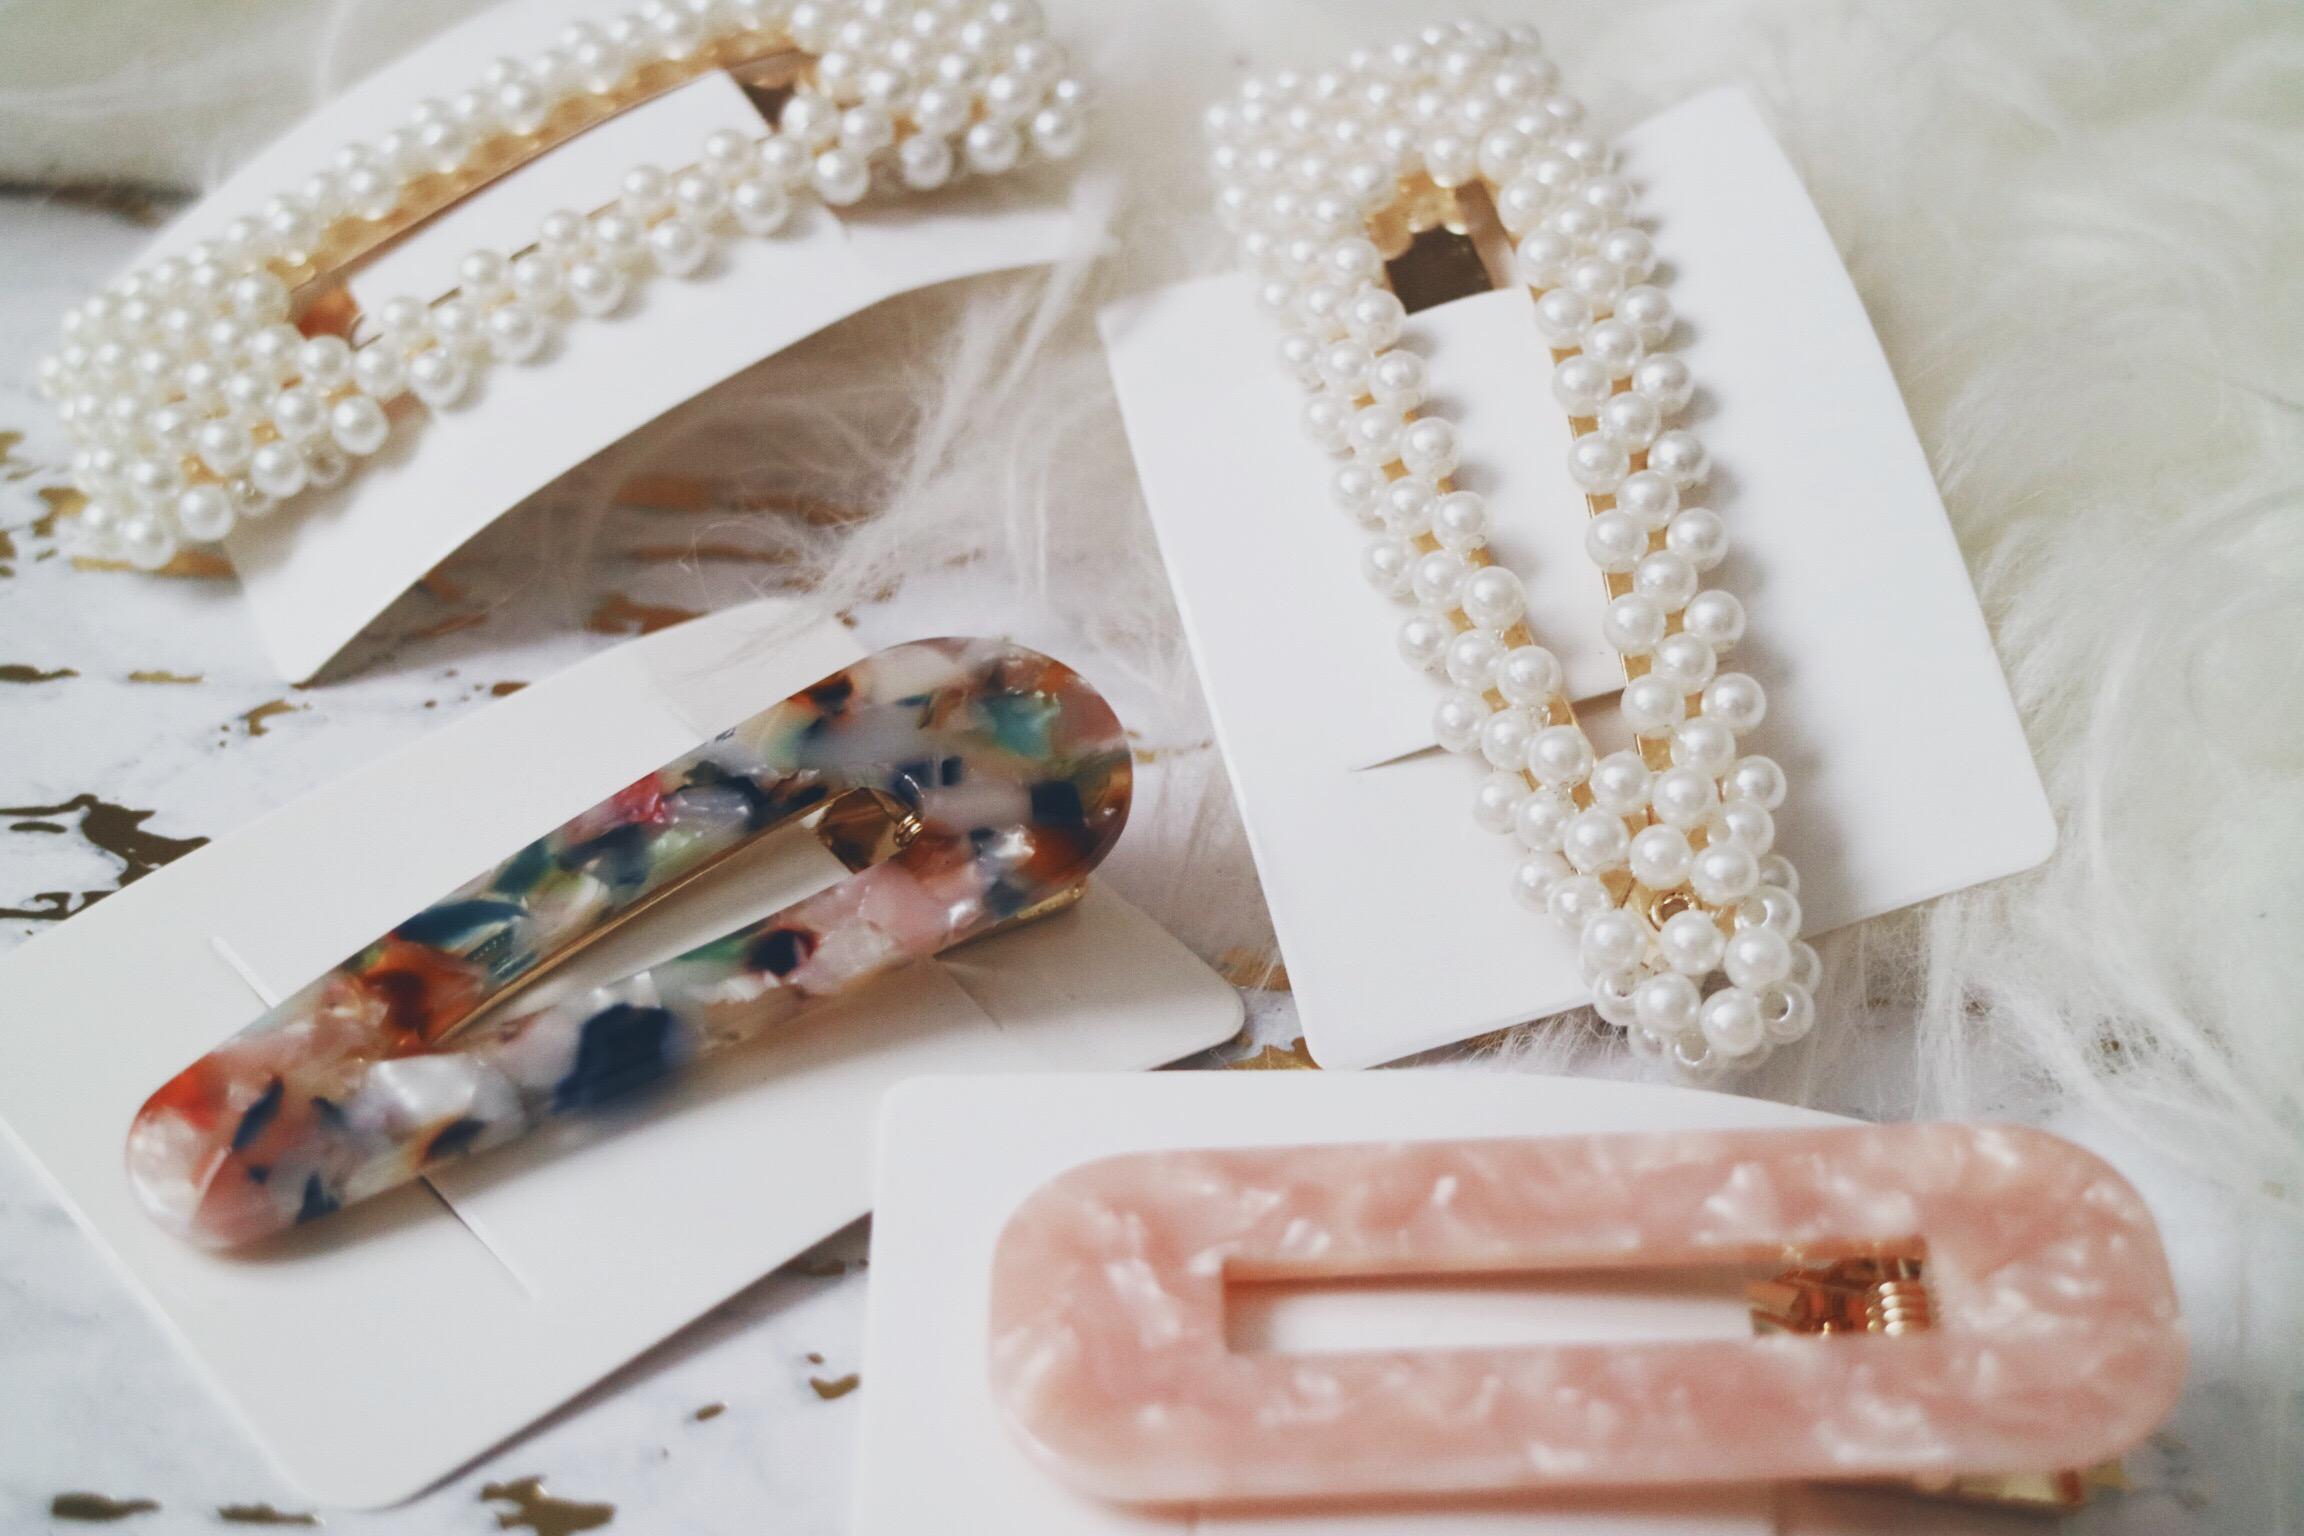 Faux Pearl Hair Barrette, Multicolored Resin Hair Barrette and Pink Resin Hair Barrette